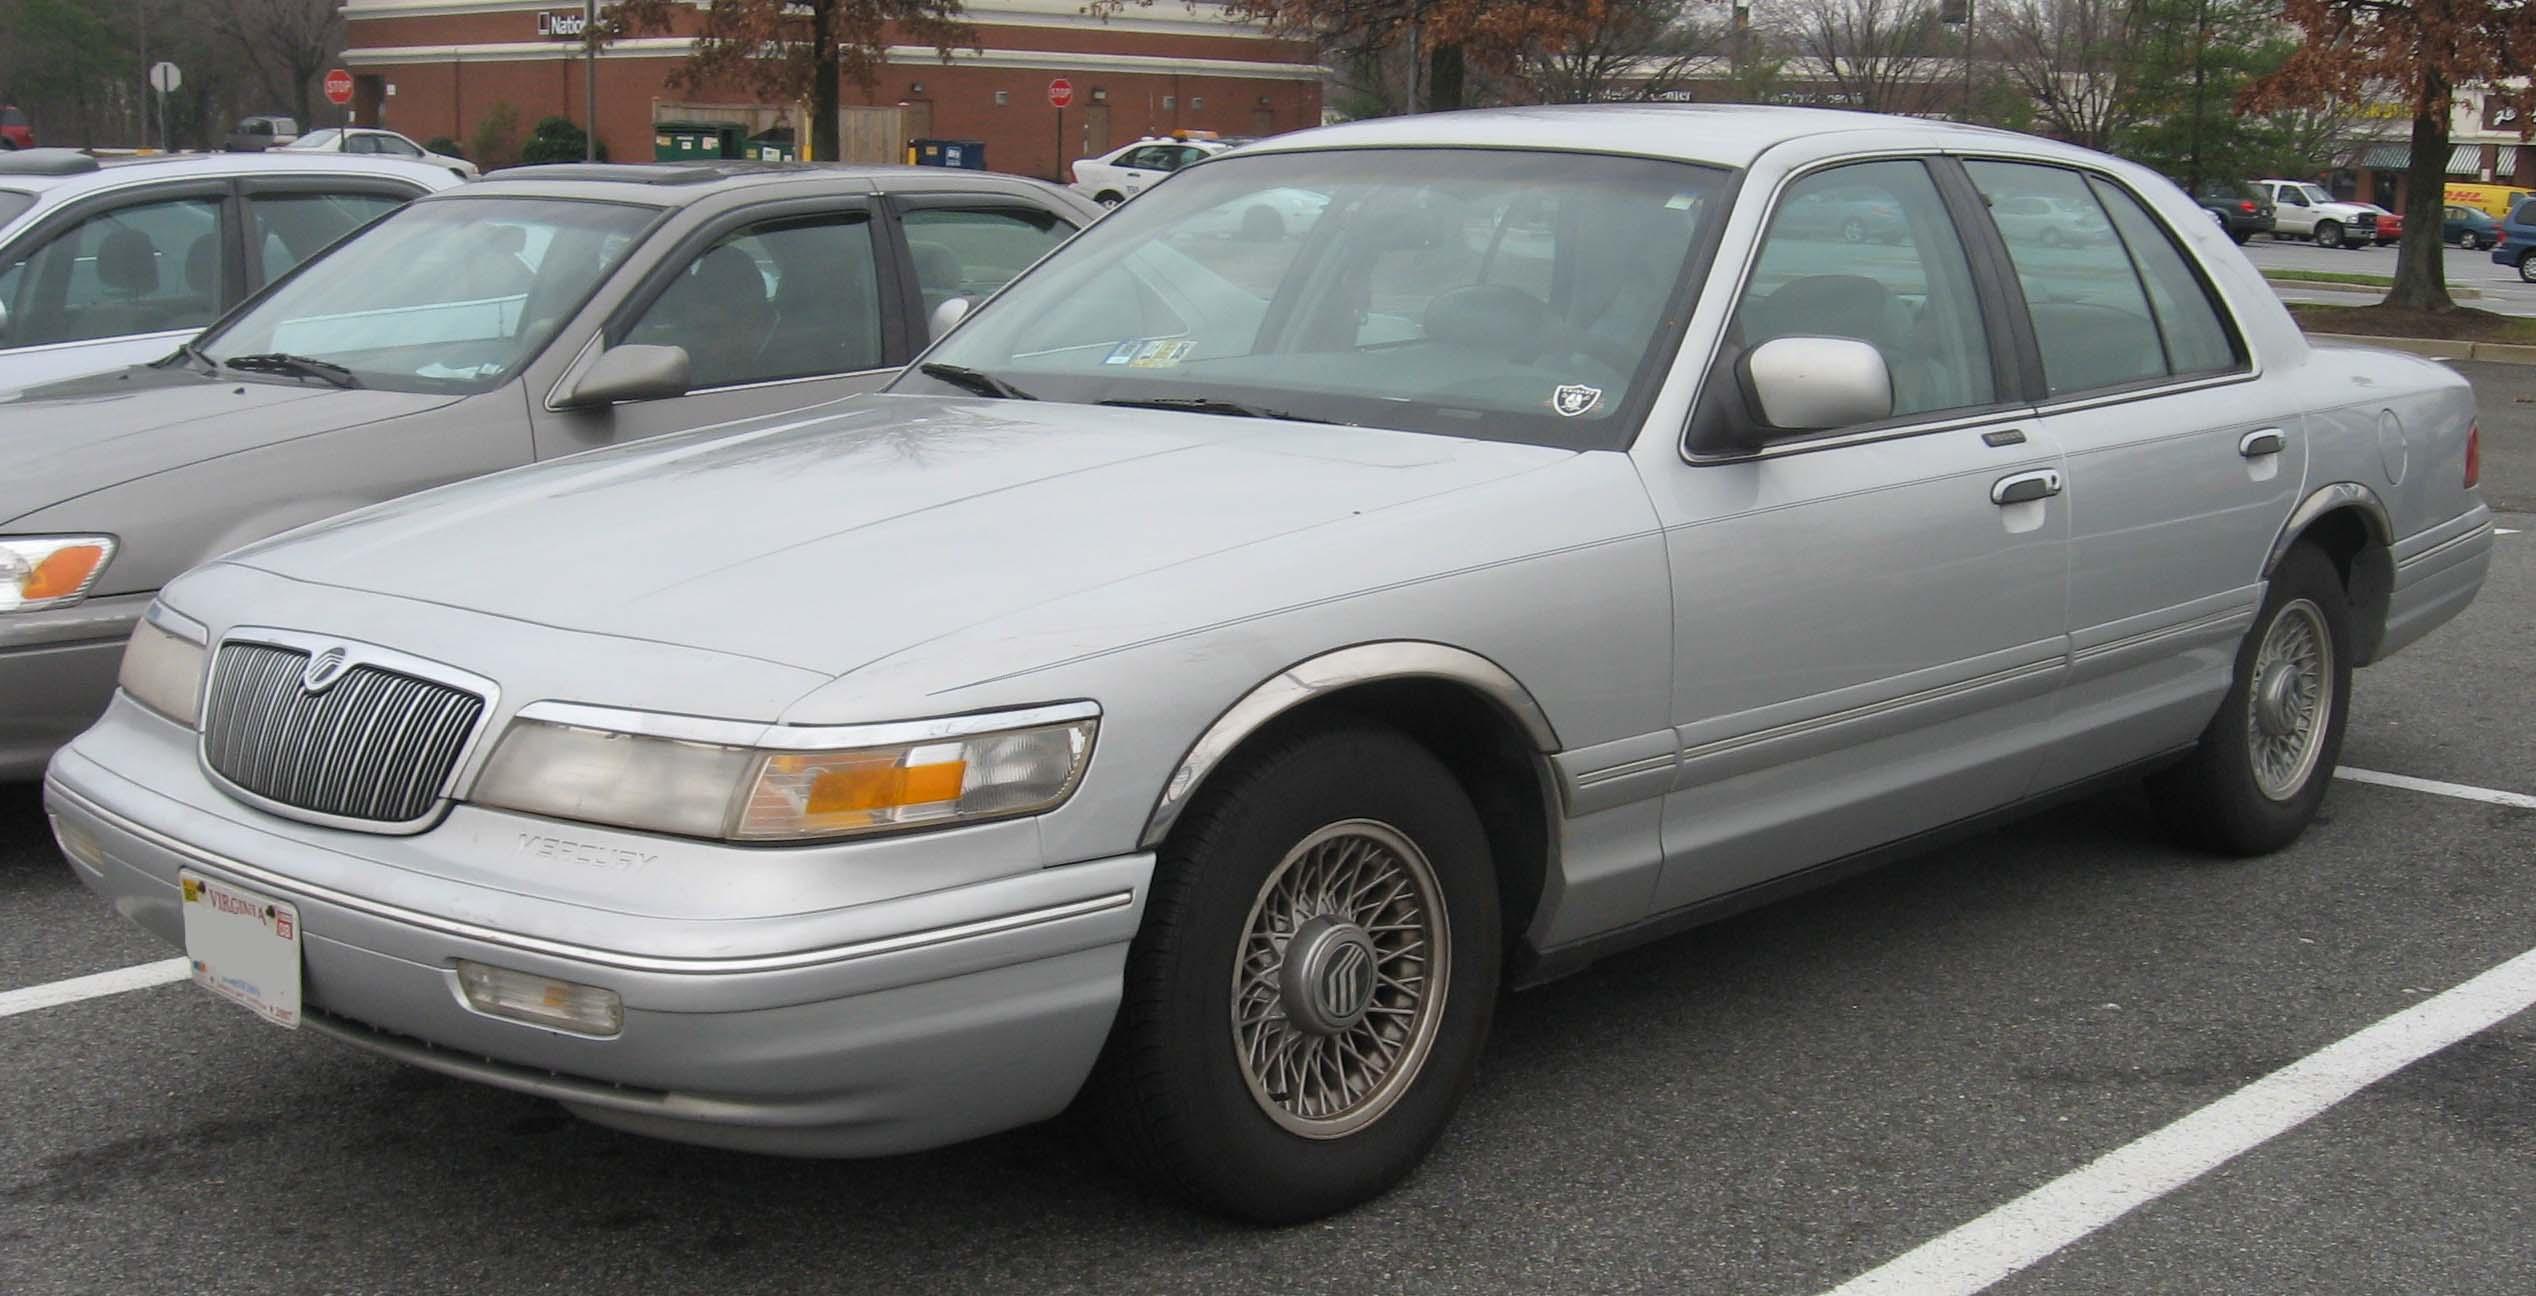 File:95-97 Mercury Grand Marquis.jpg - Wikimedia Commons